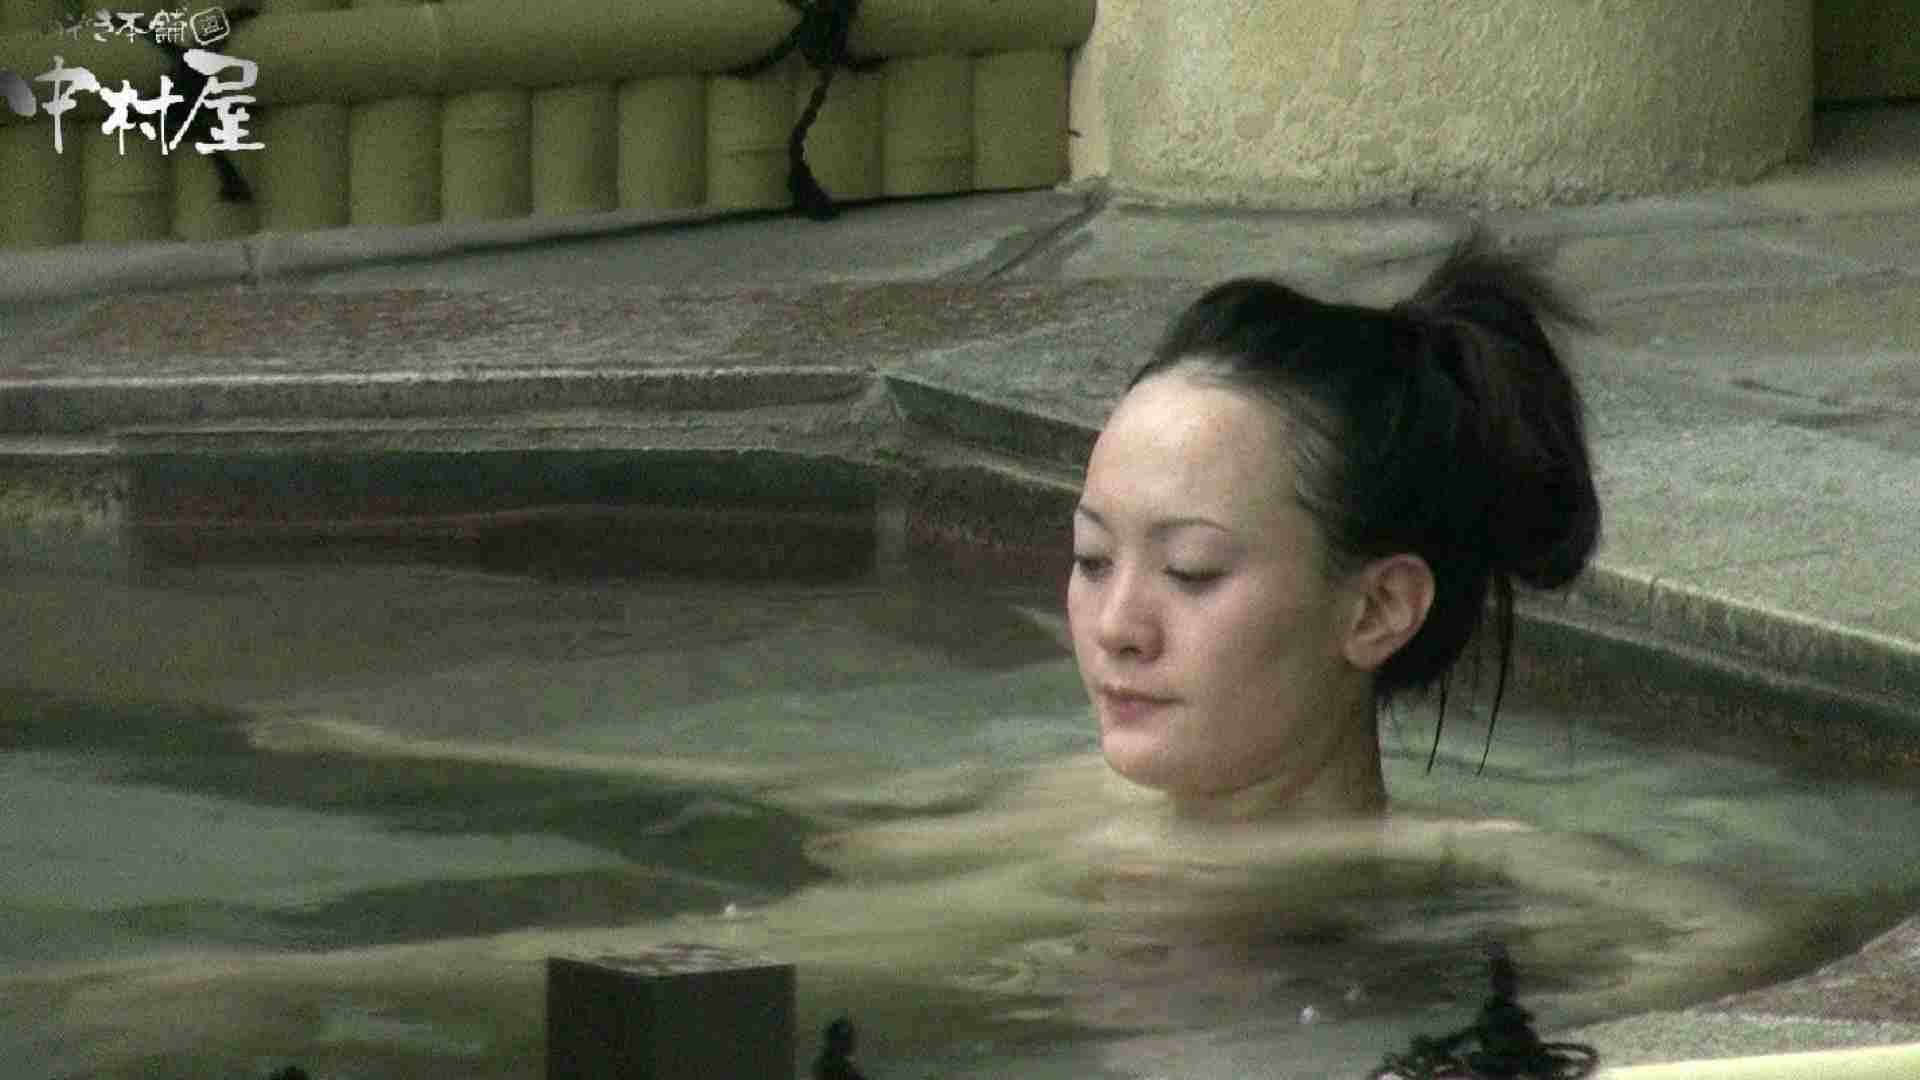 Aquaな露天風呂Vol.903 露天 オメコ無修正動画無料 85pic 19